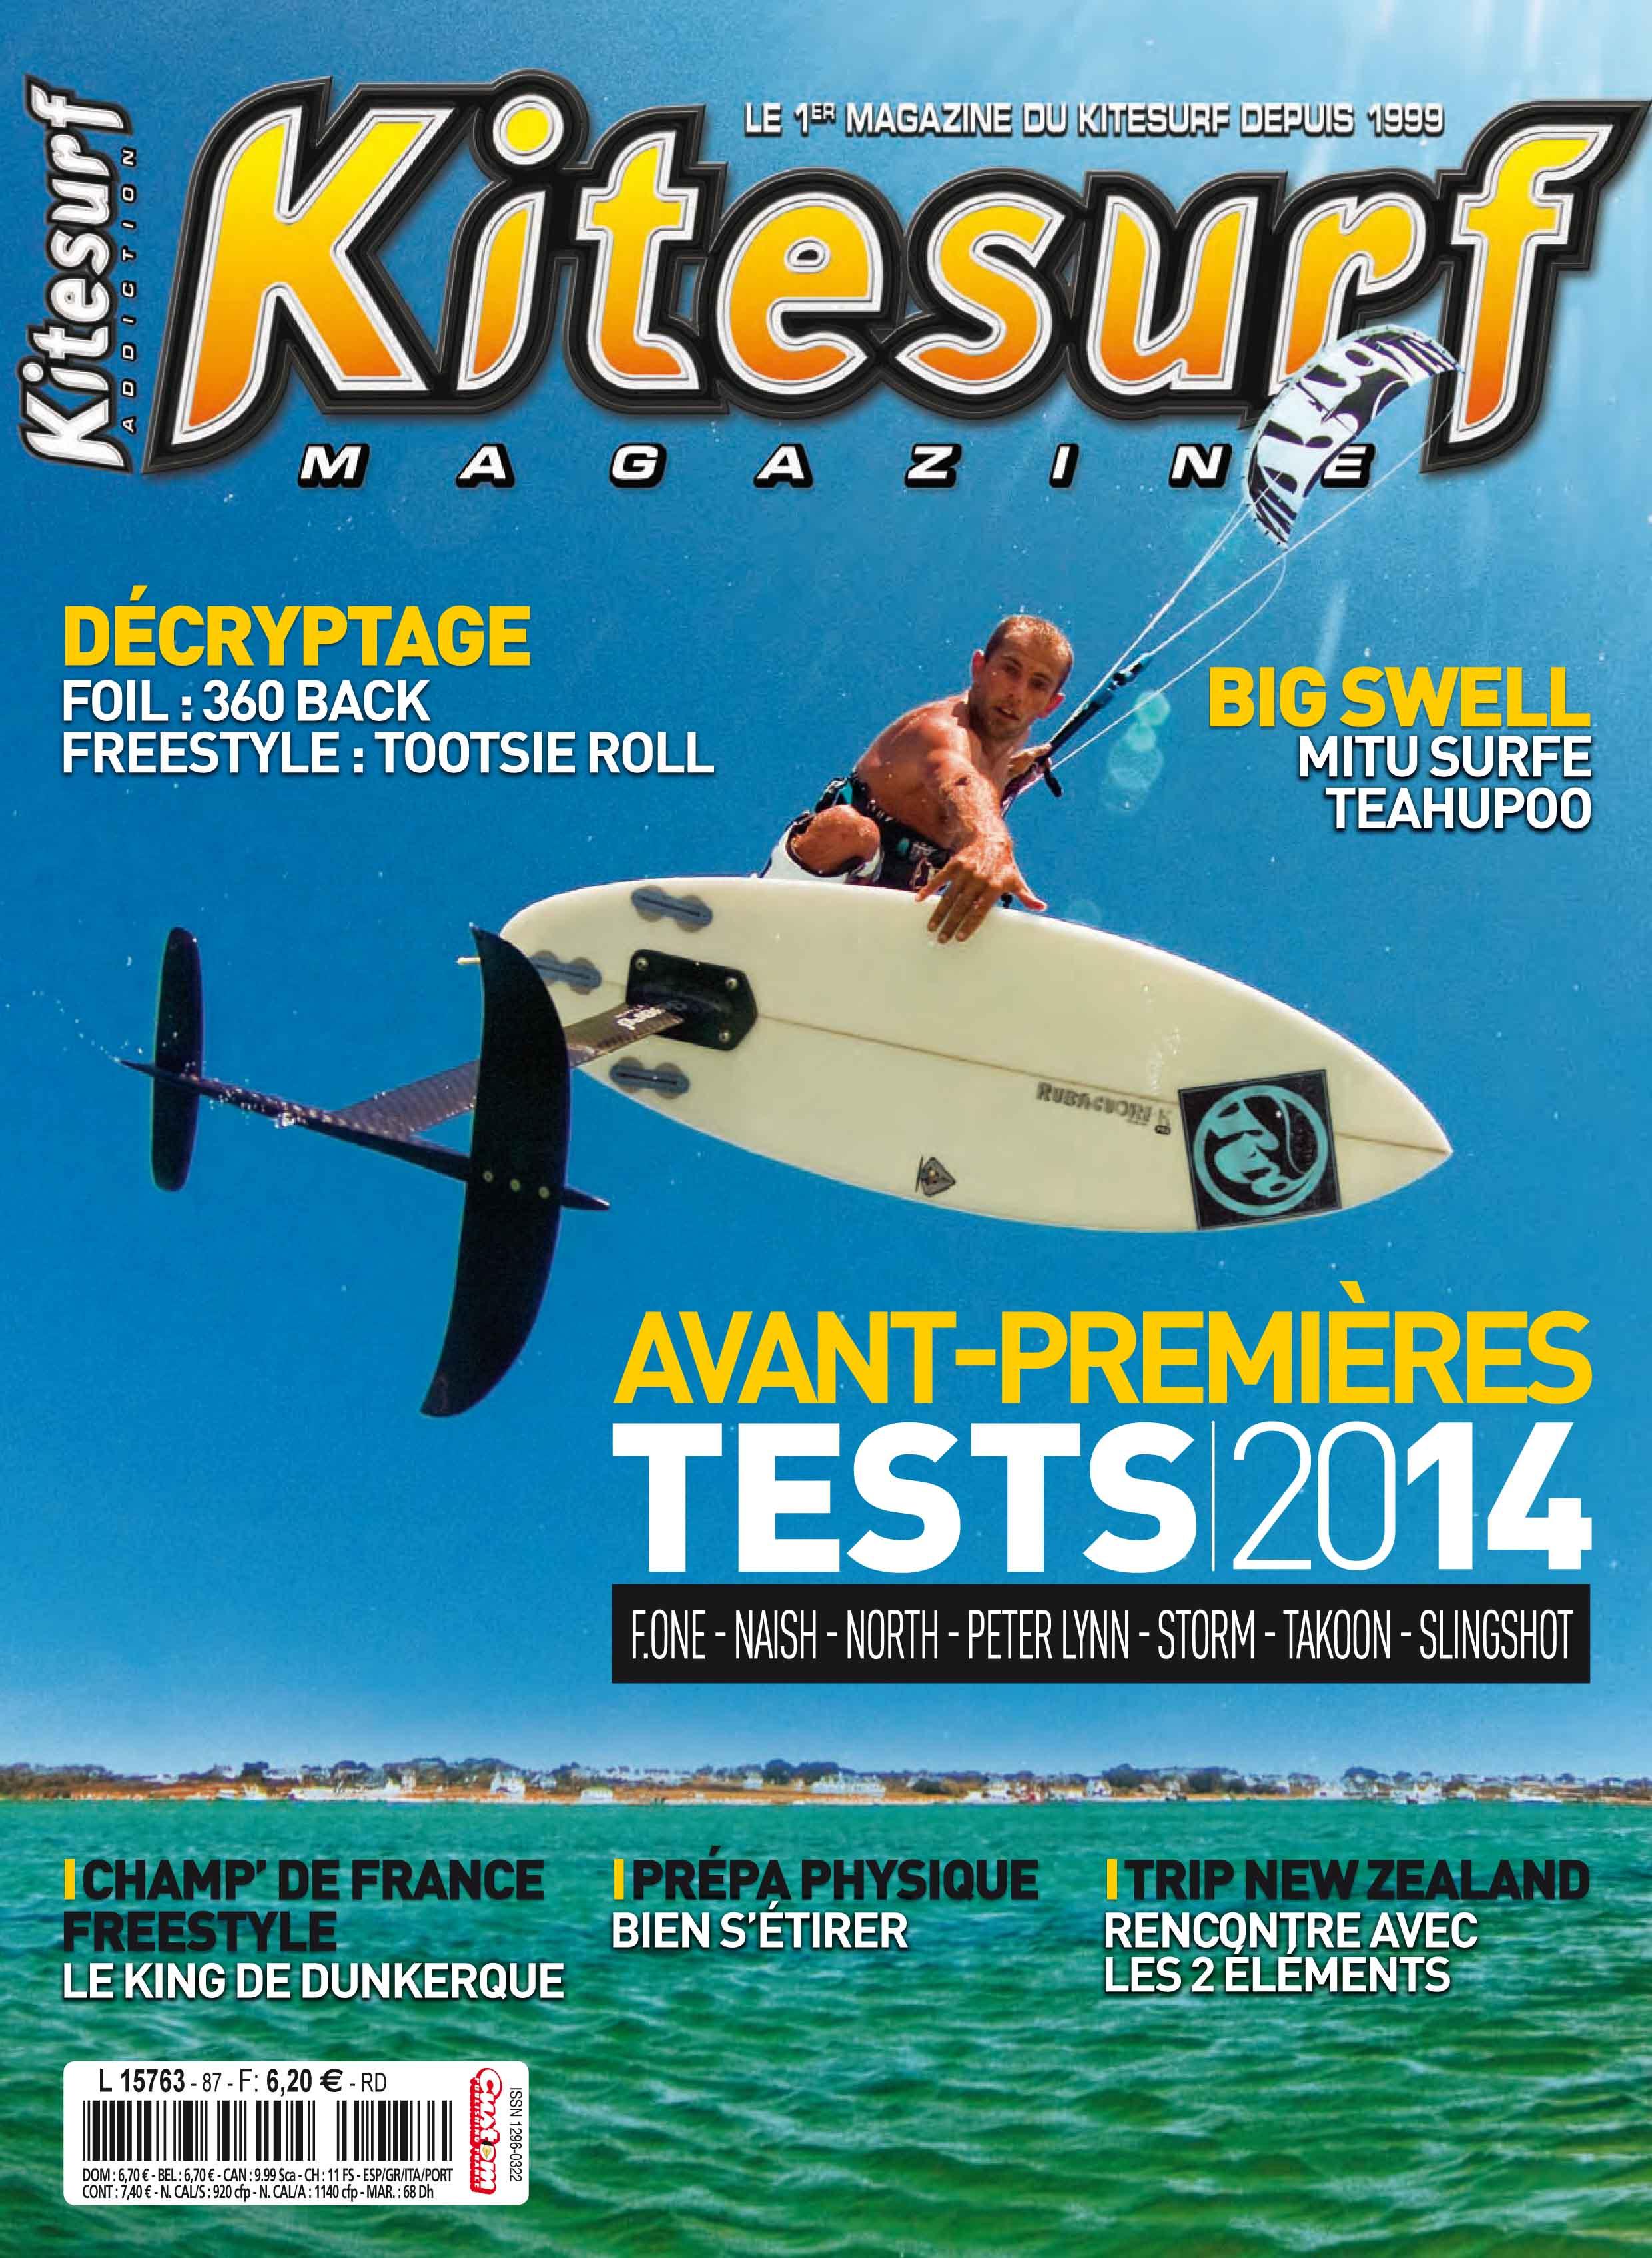 Kitesurf Magazine fait l'article sur le TKC 2013